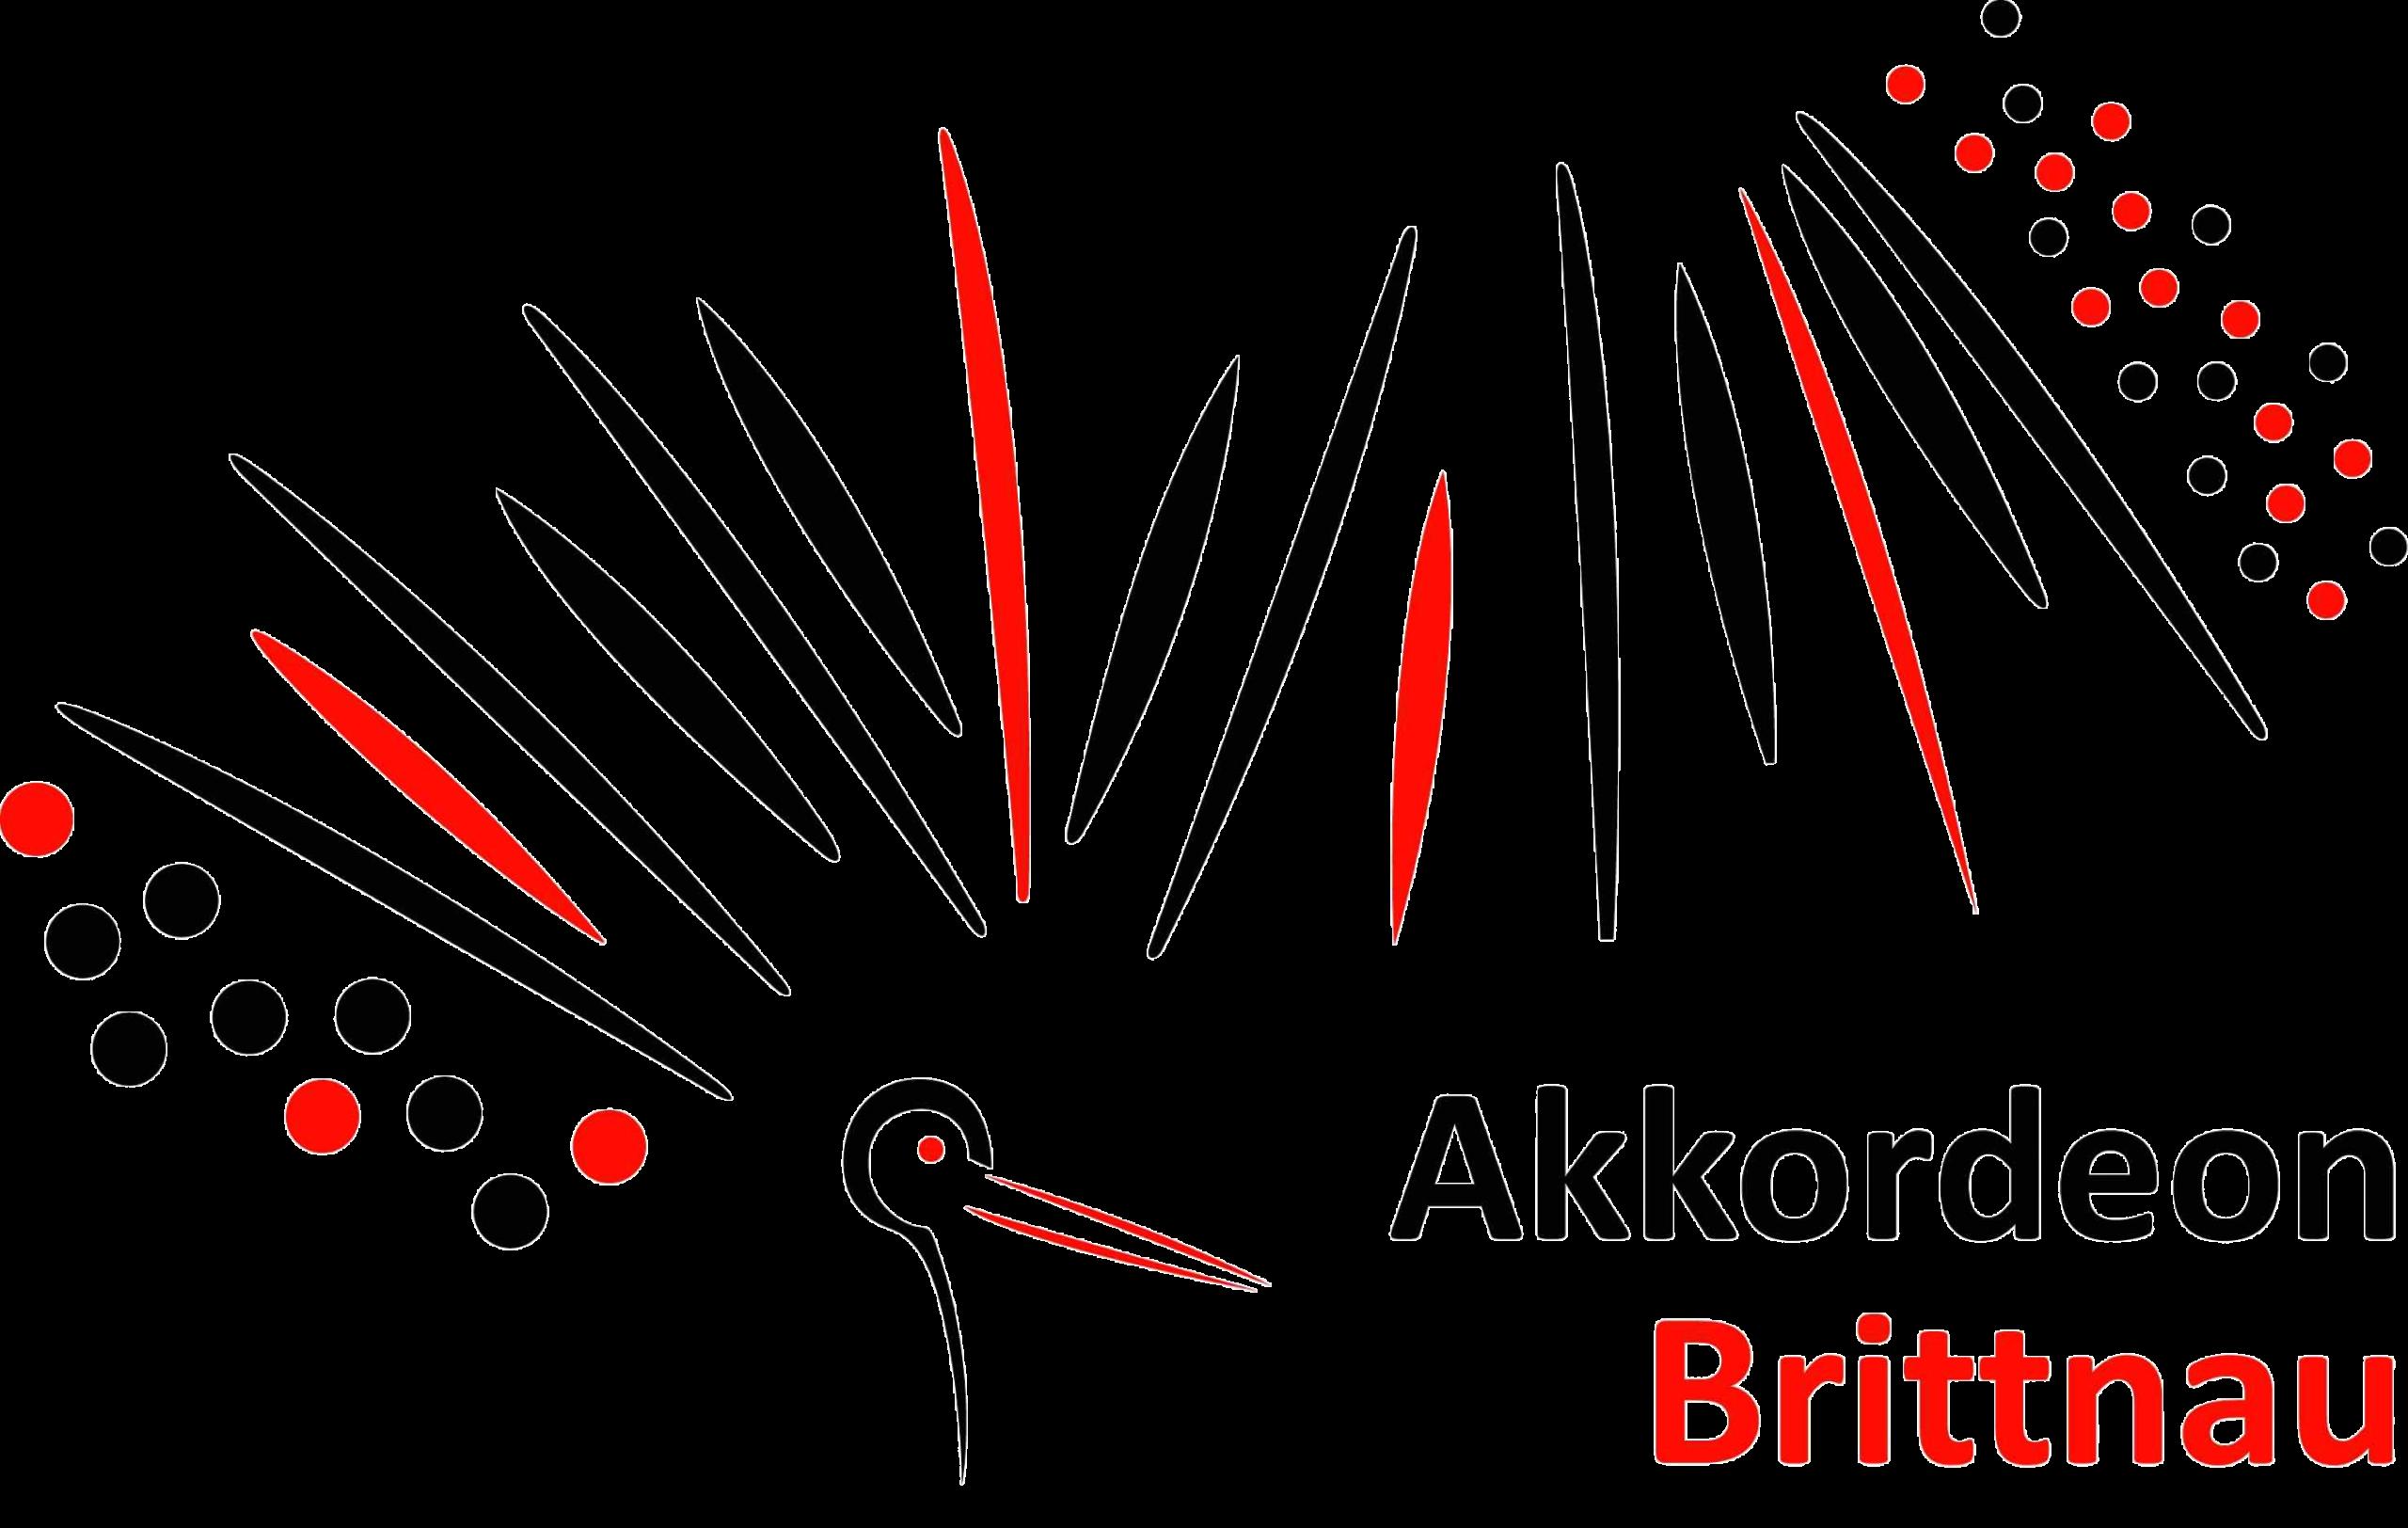 Akkordeon Brittnau